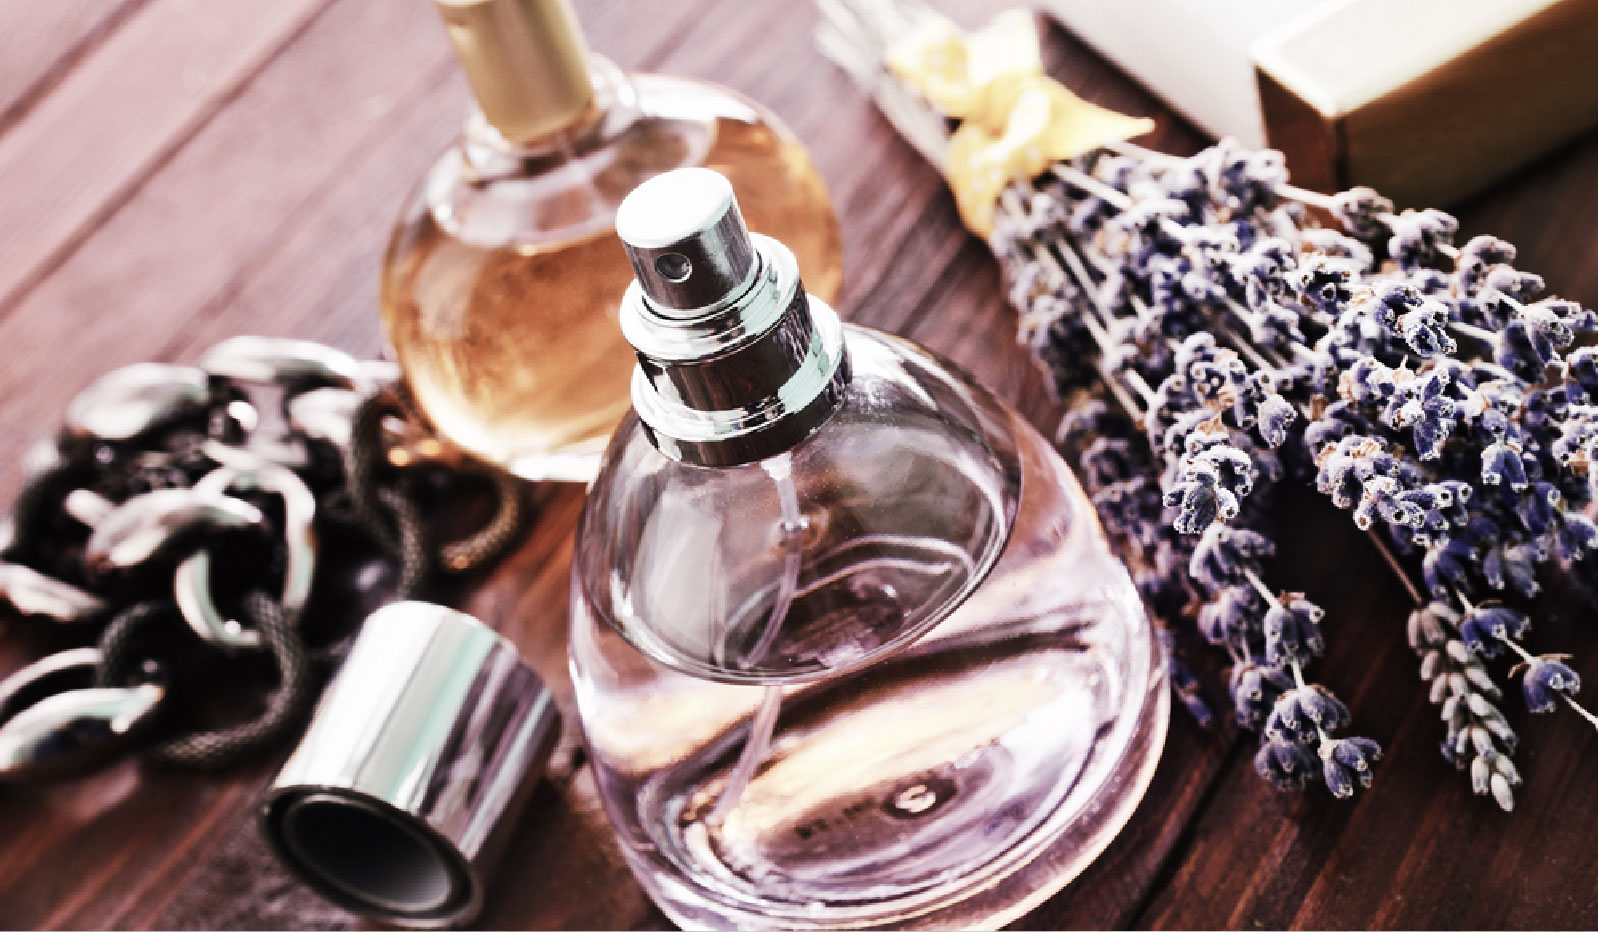 Fougere Jizan Perfumes